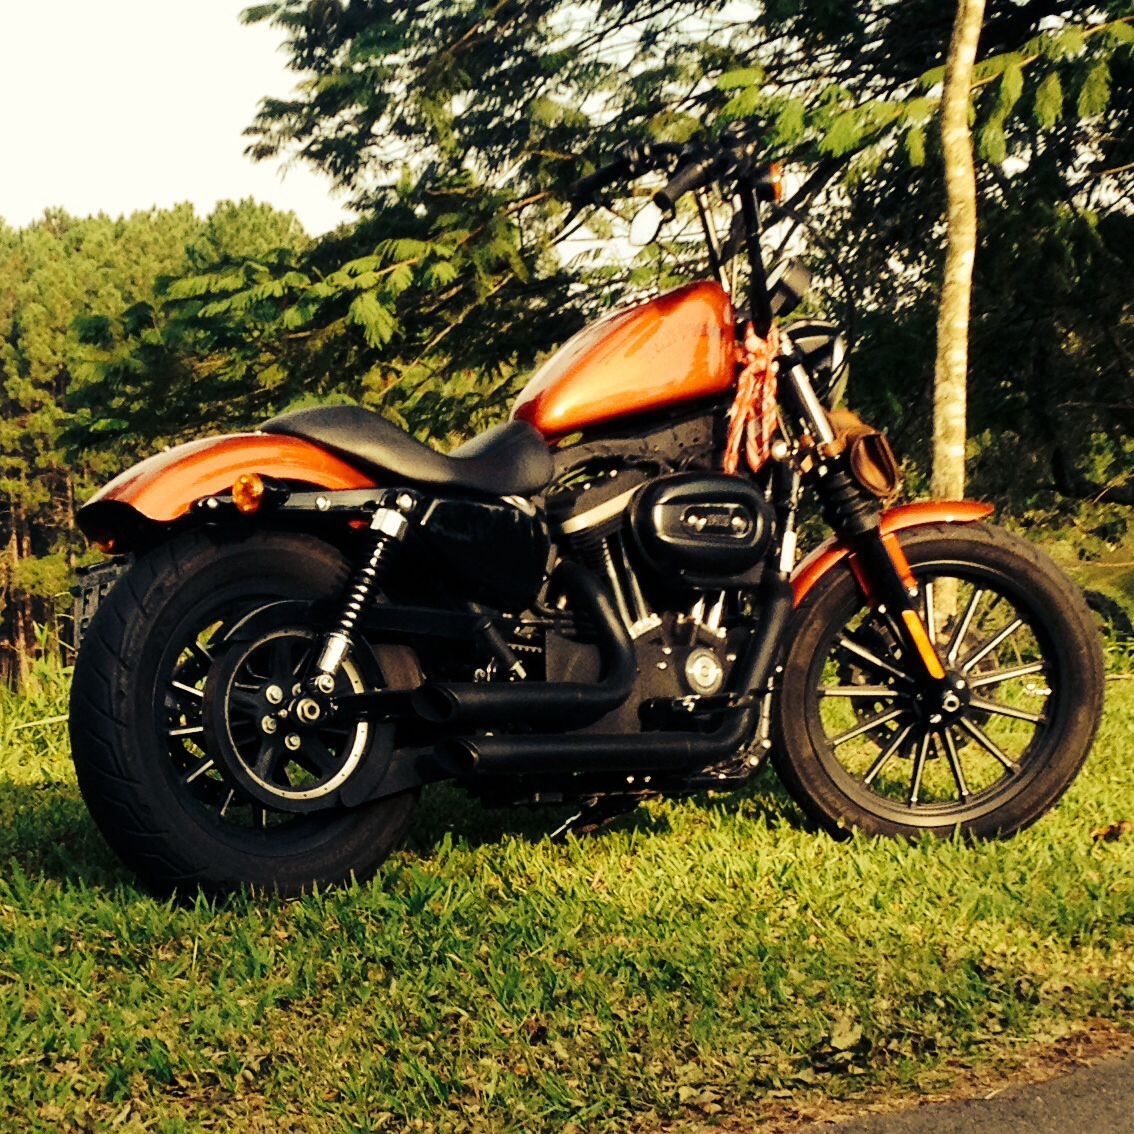 Harley Davidson Sportster 883 Iron Candy Orange Harley Davidson Harley Harley Davidson Sportster 883